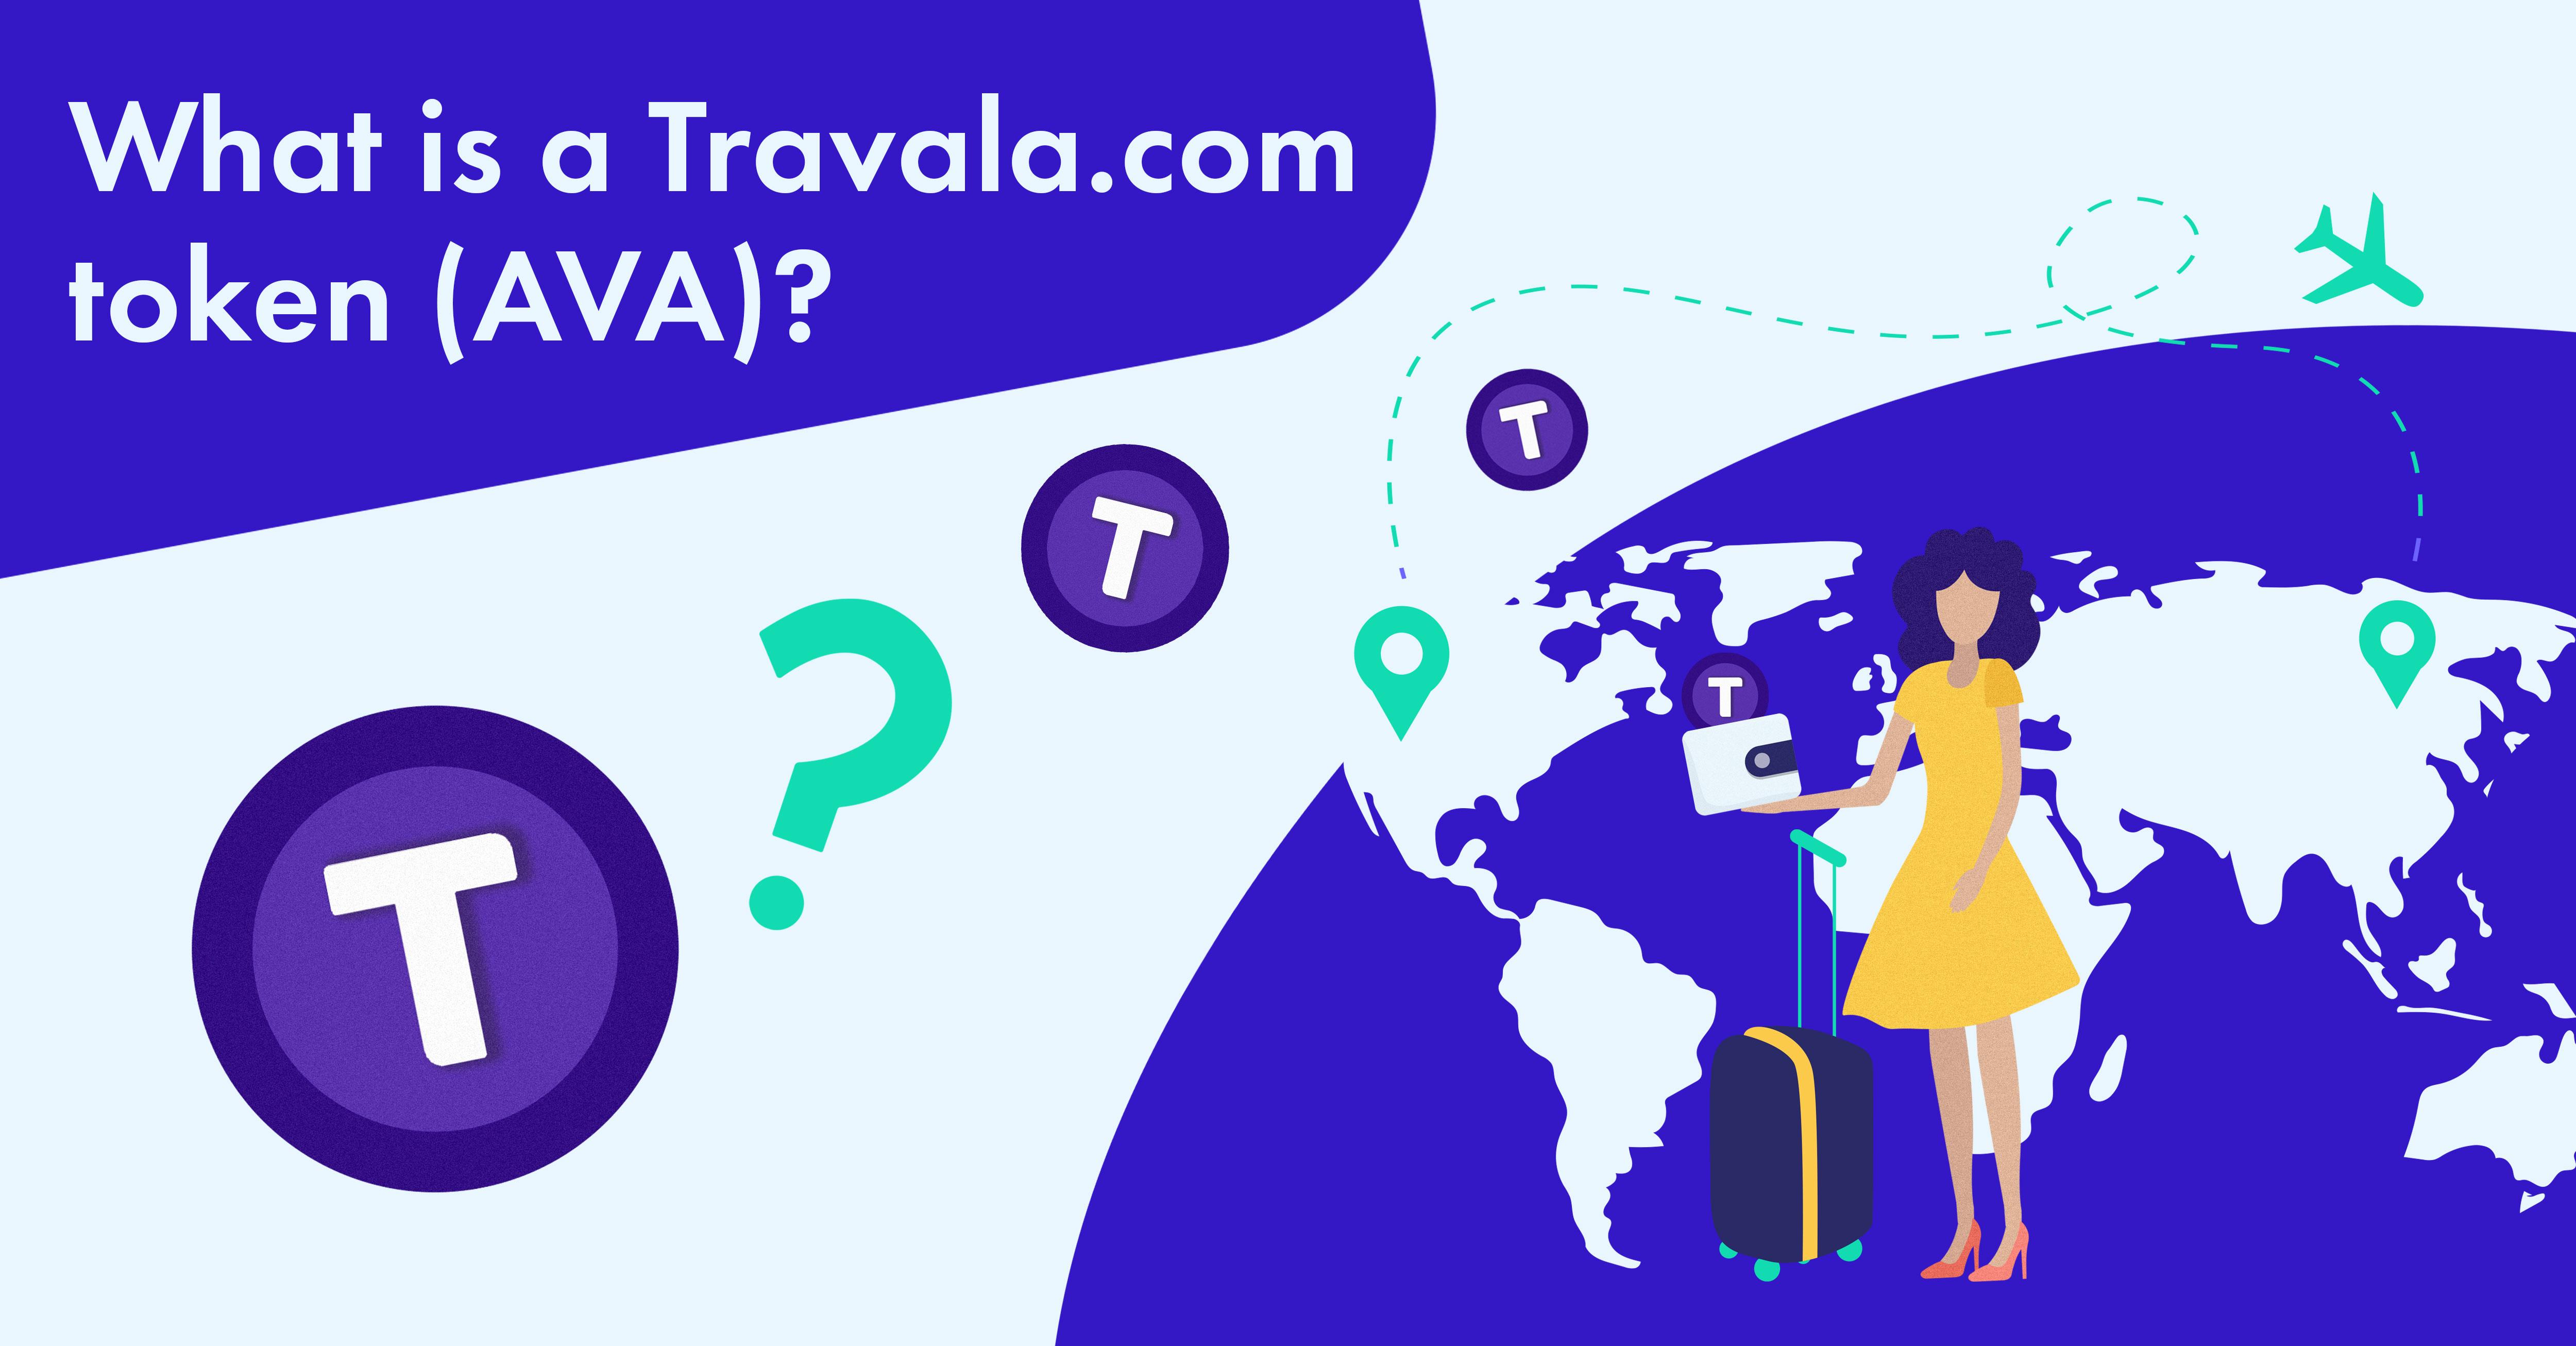 travala.com token ava